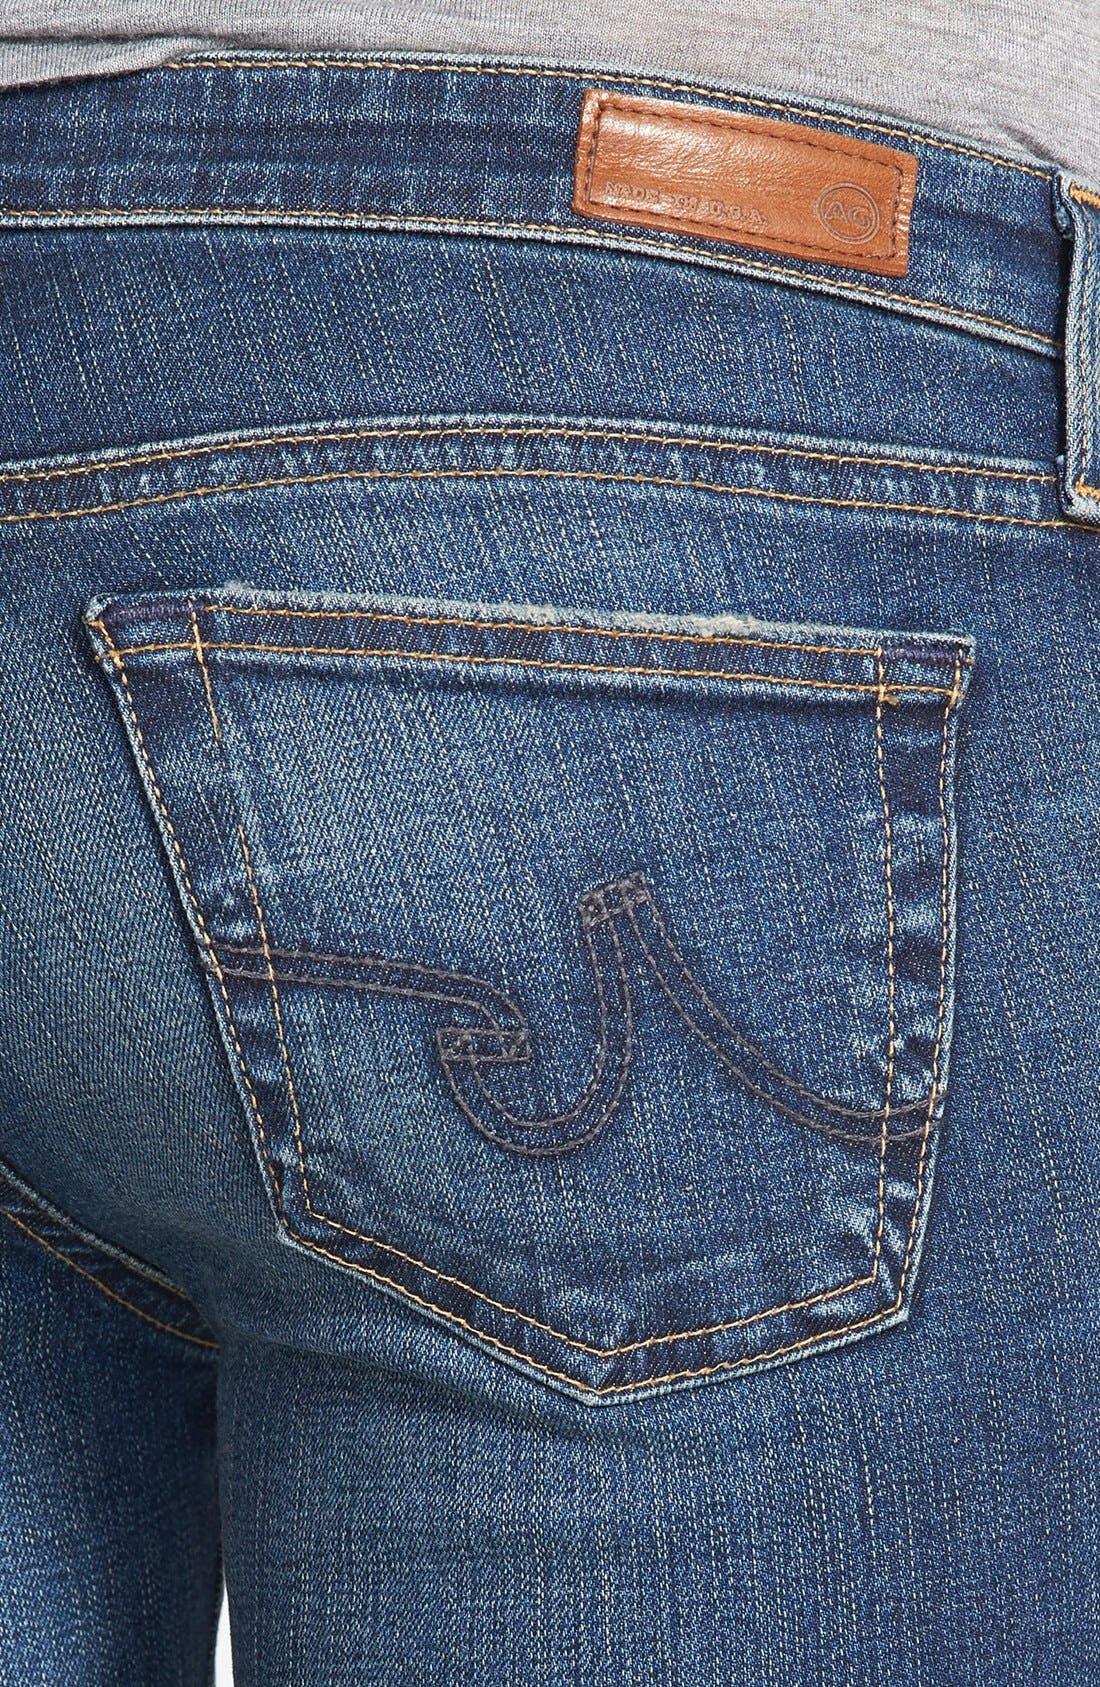 'The Legging' Super Skinny Jeans,                             Alternate thumbnail 25, color,